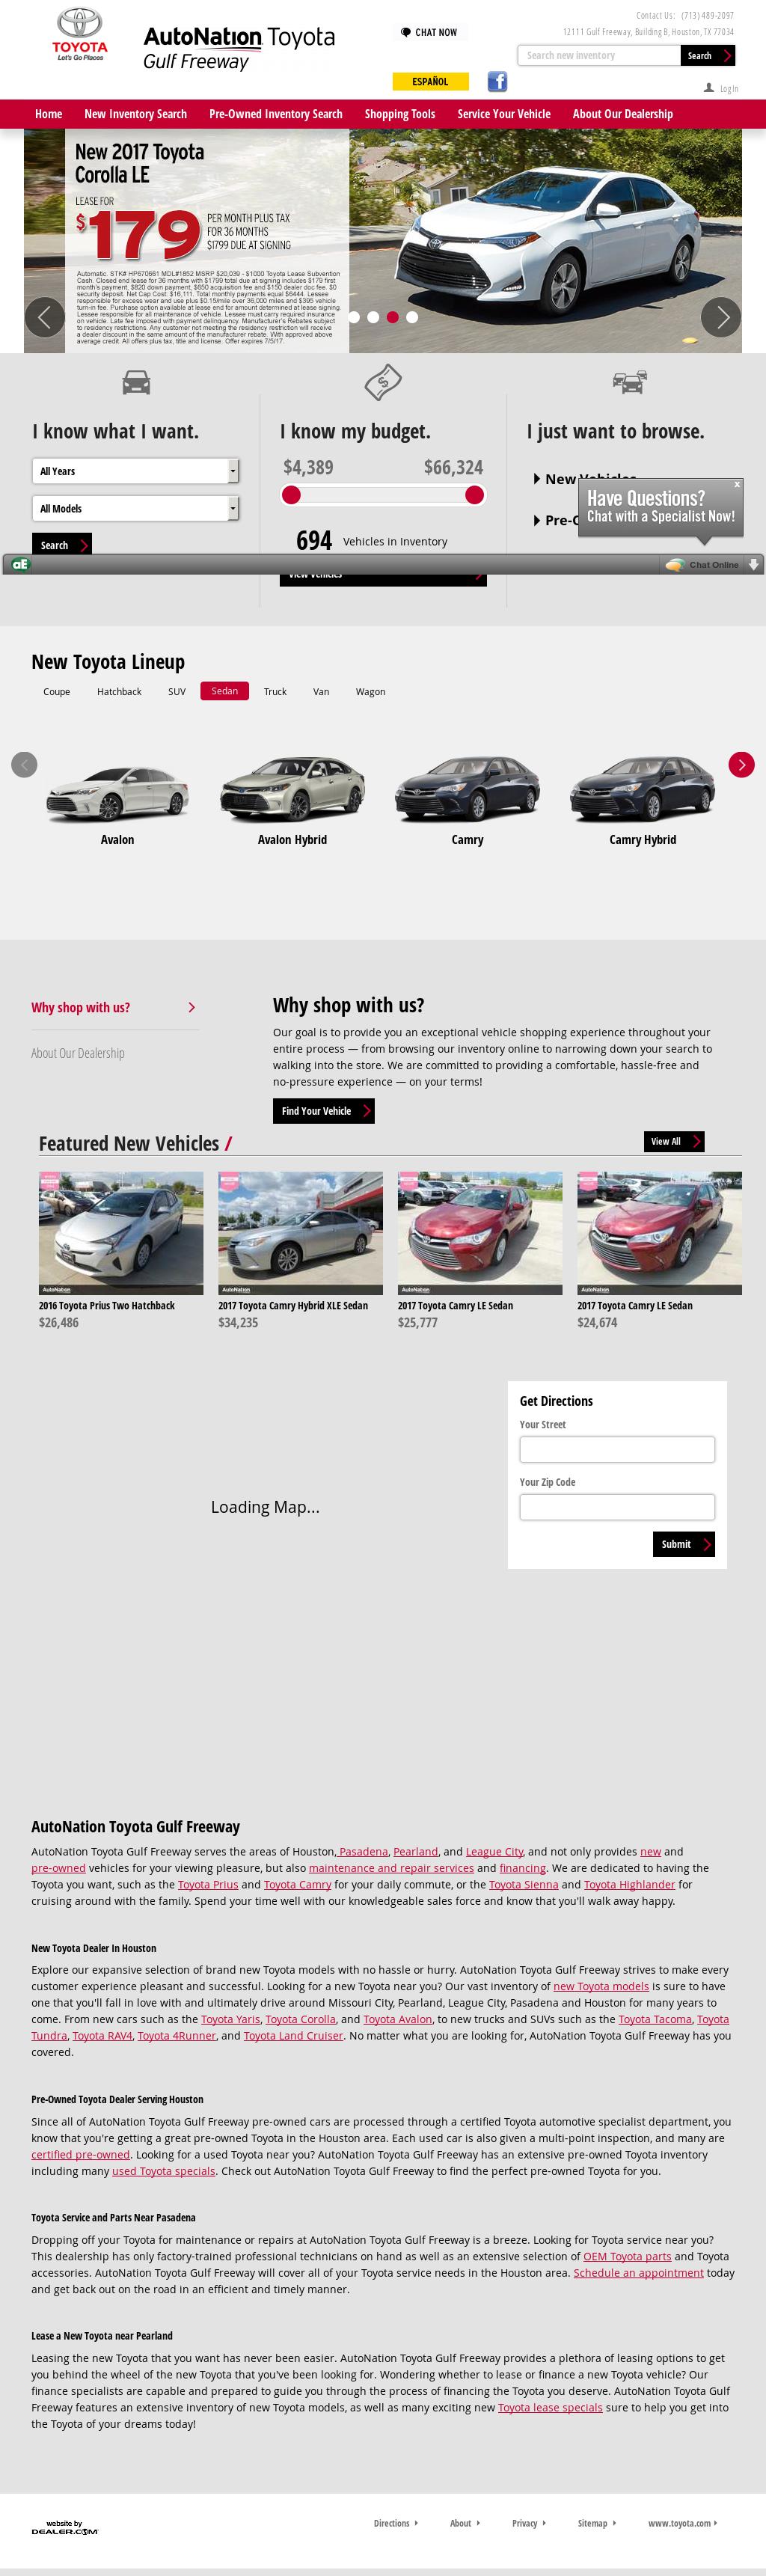 AutoNation Toyota Gulf Freeway petitors Revenue and Employees